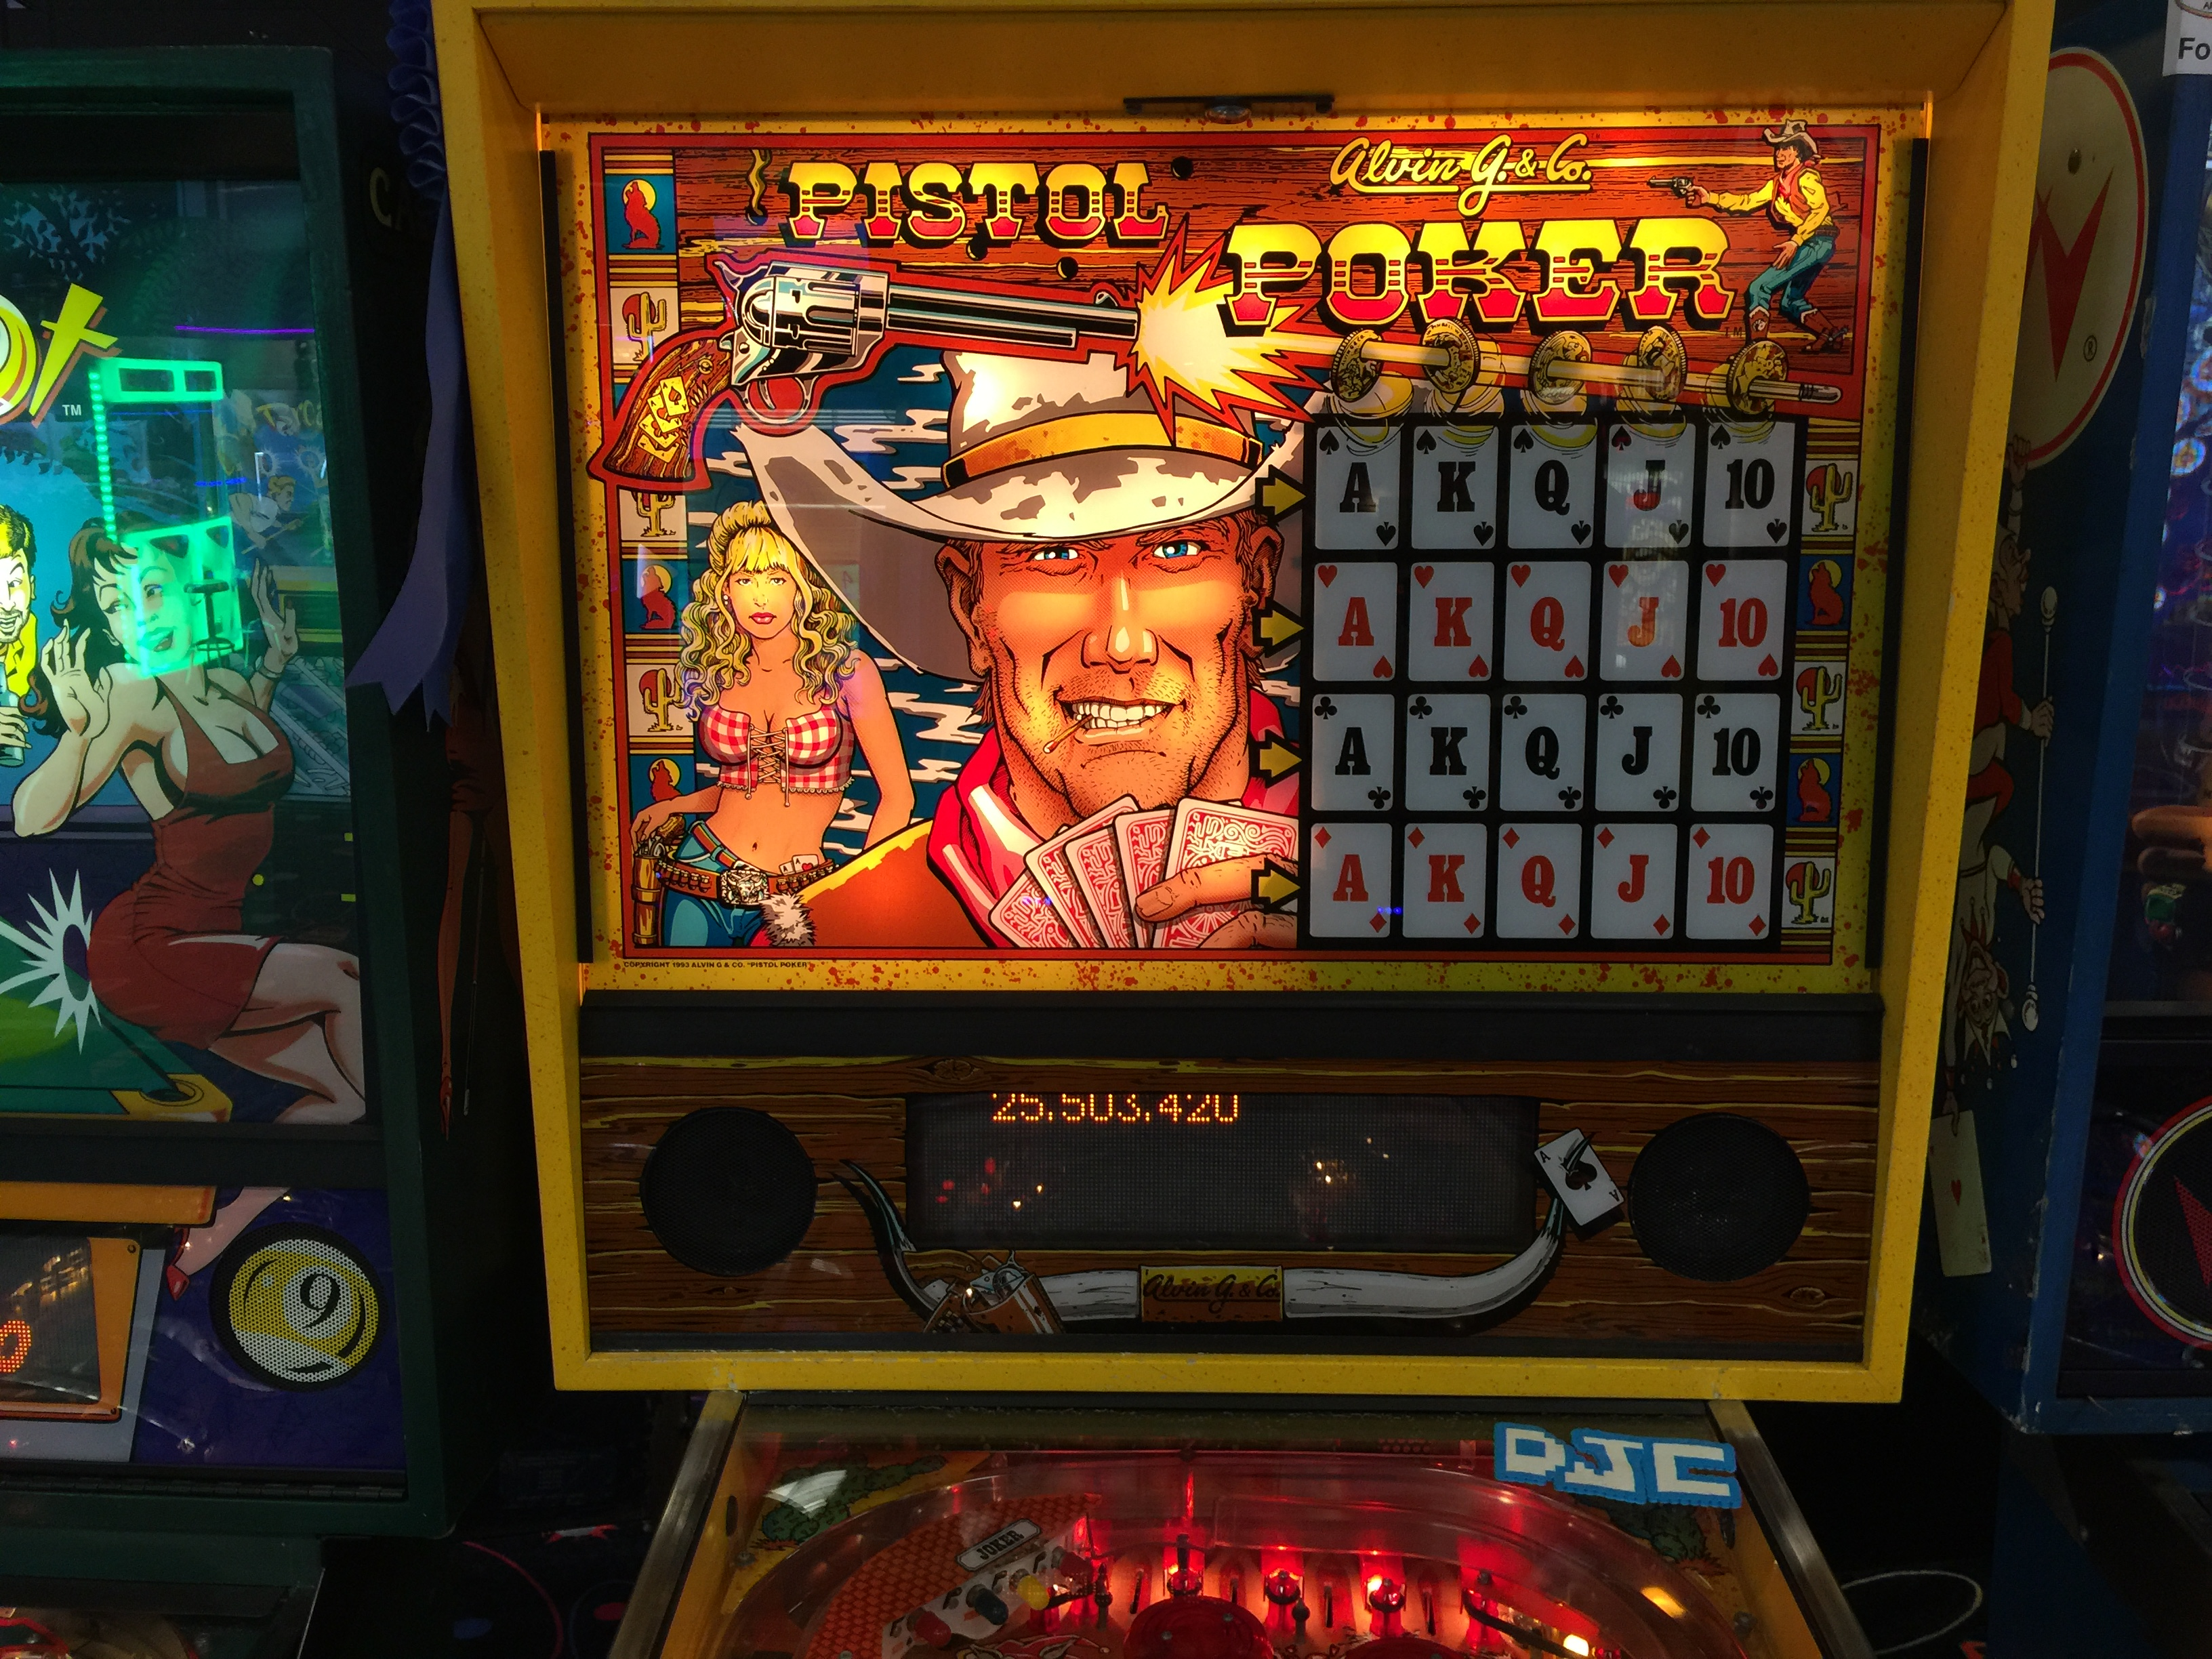 derek: Pistol Poker (Pinball: 3 Balls) 25,503,420 points on 2016-05-21 11:27:17